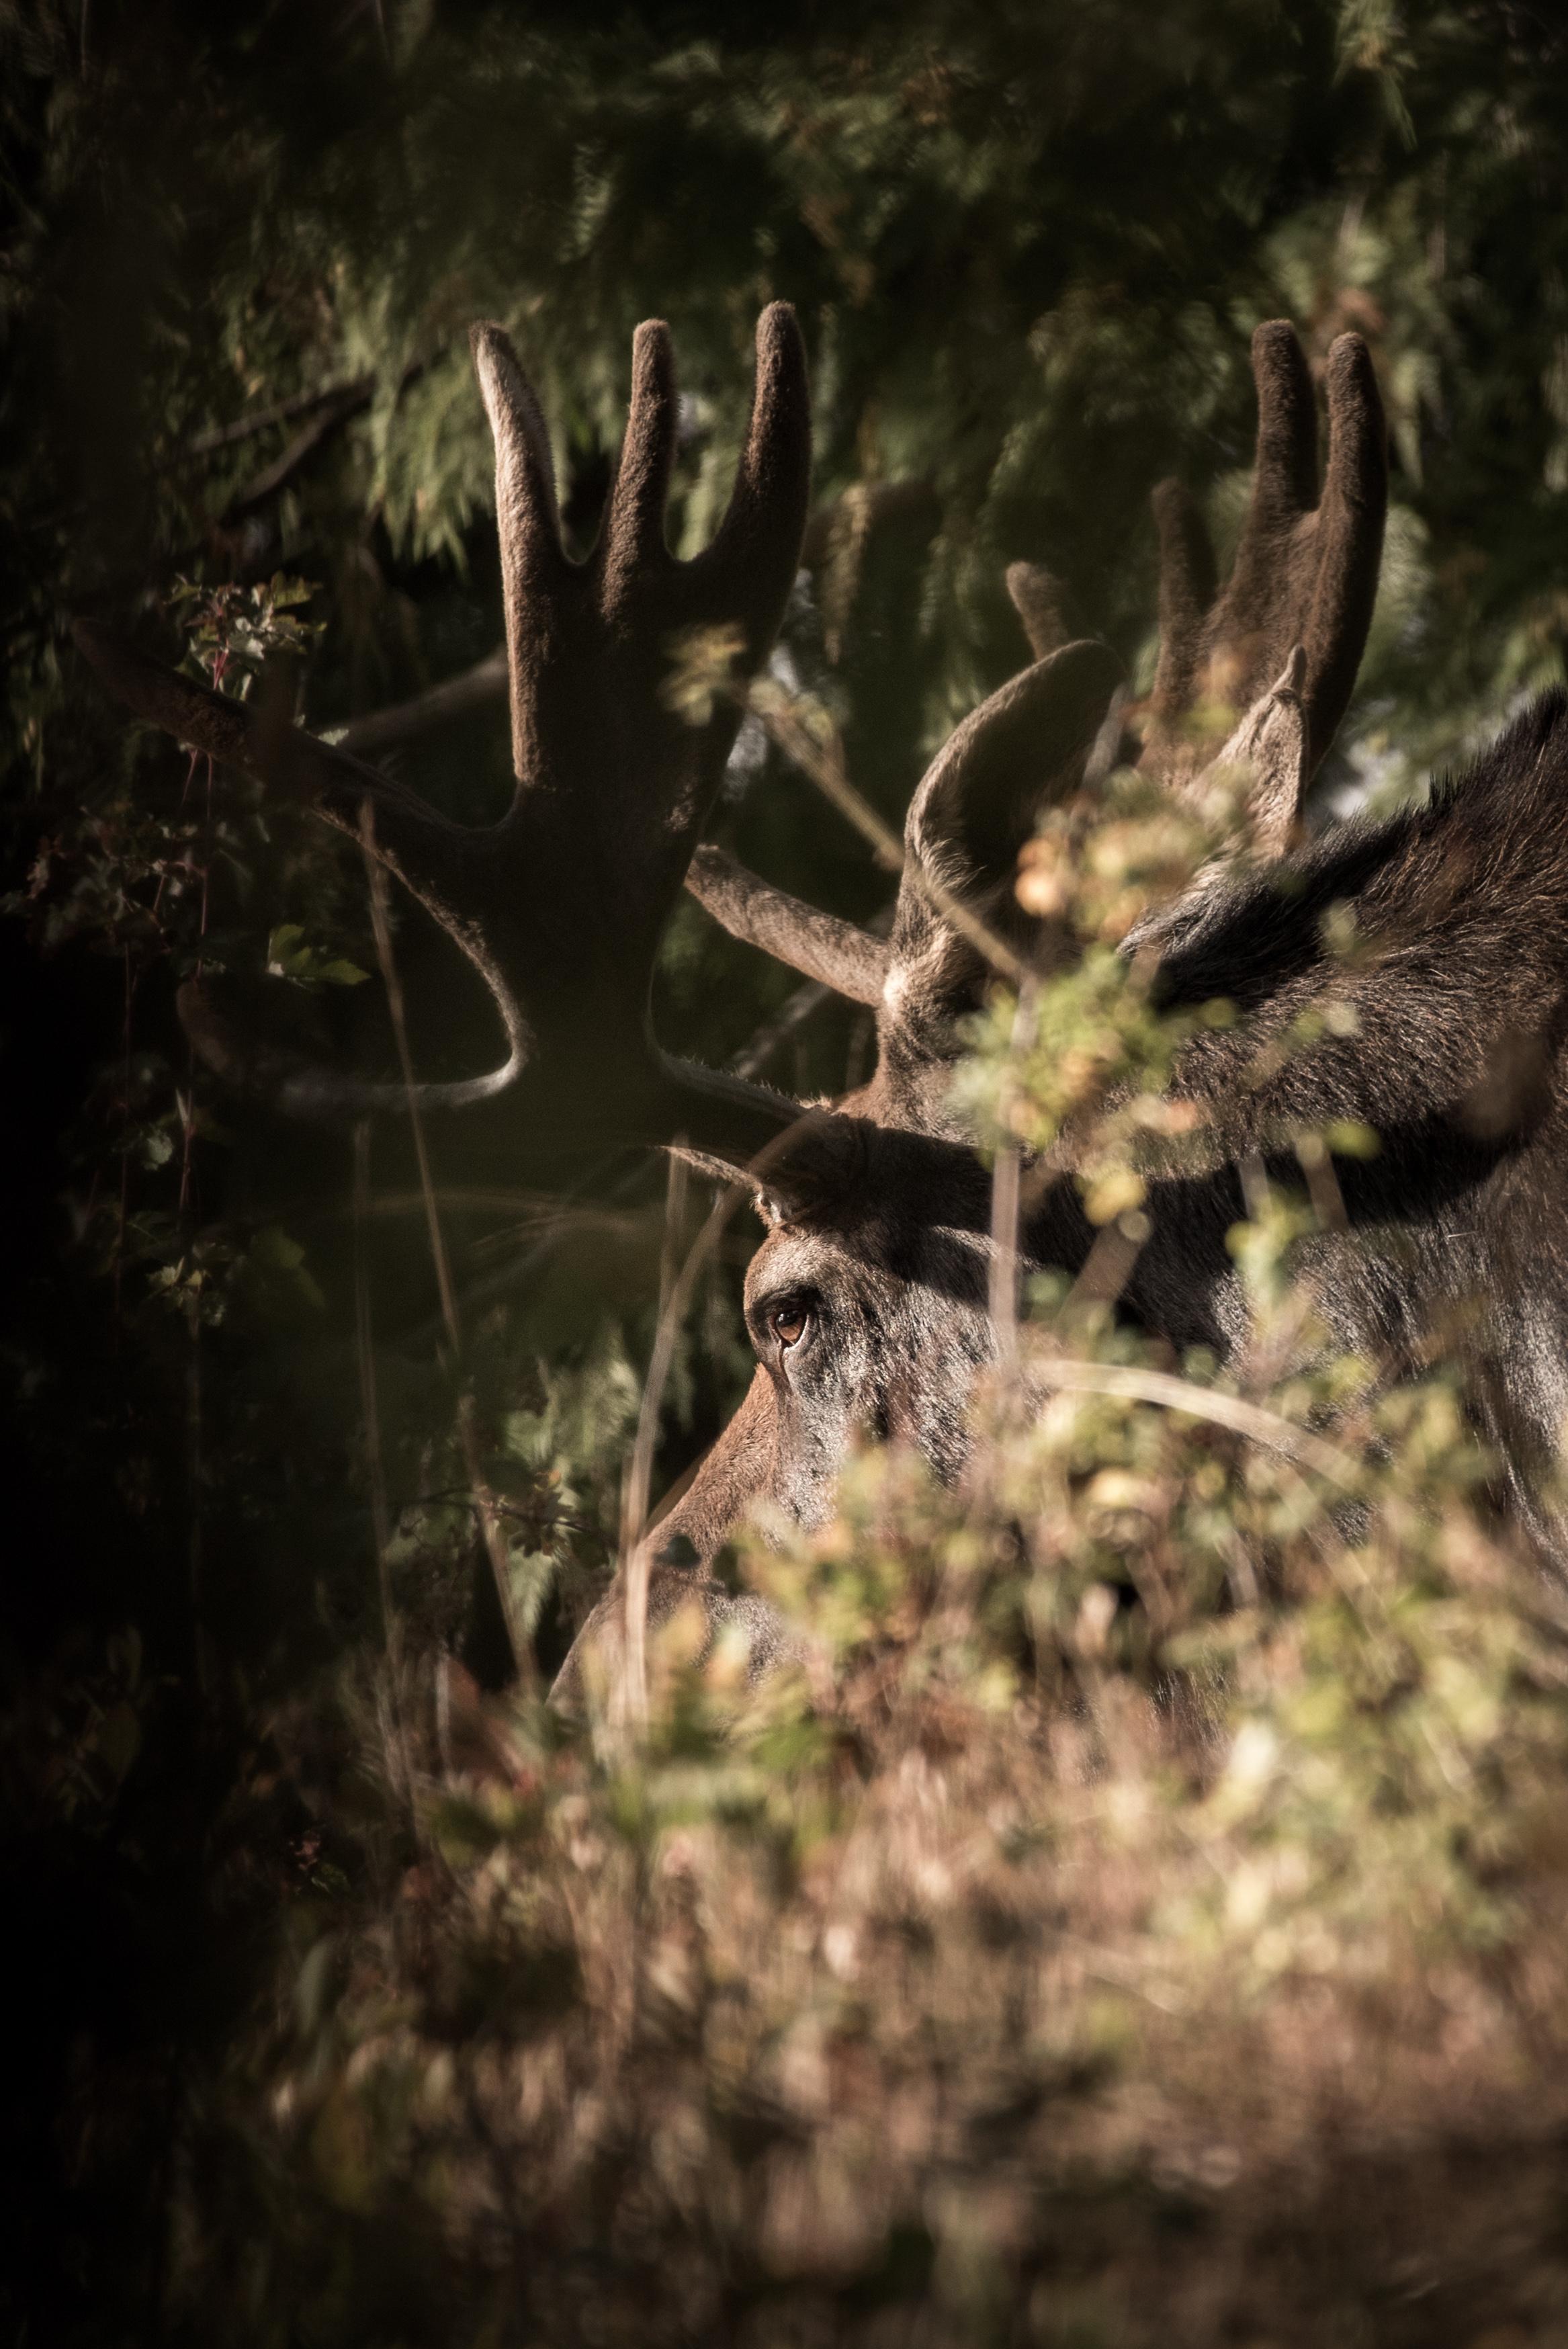 Bull Moose - Eye Contact